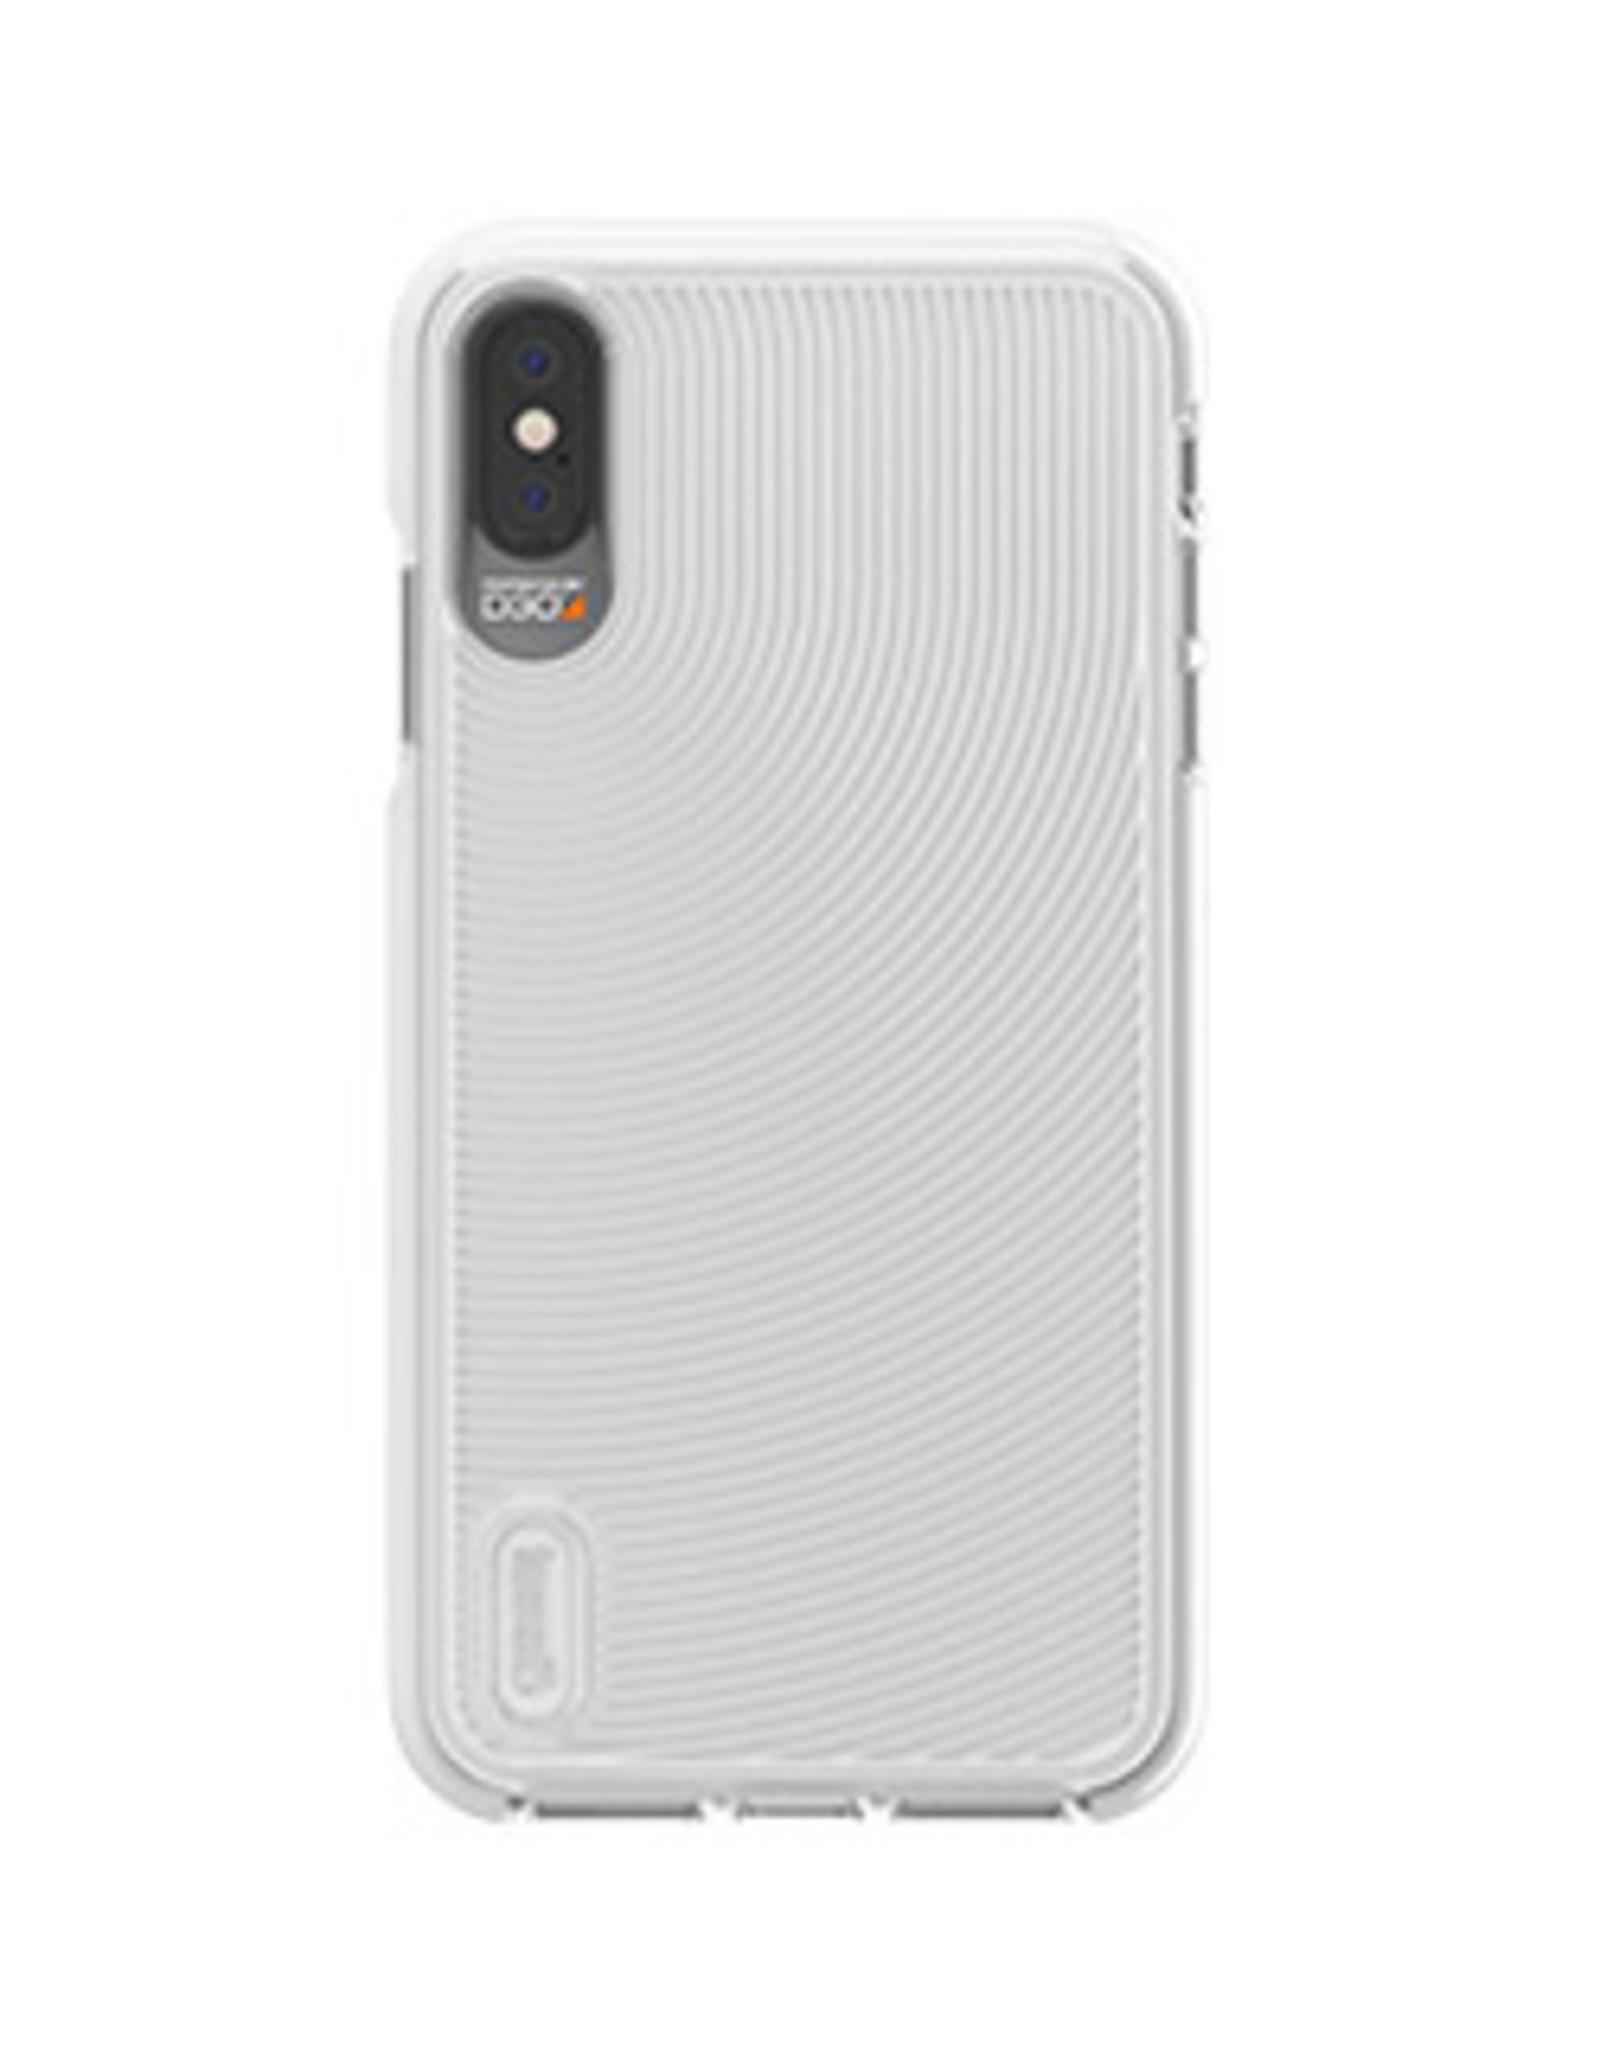 GEAR4 GEAR4 | iPhone Xs Max D3O White Battersea Case | 15-03434